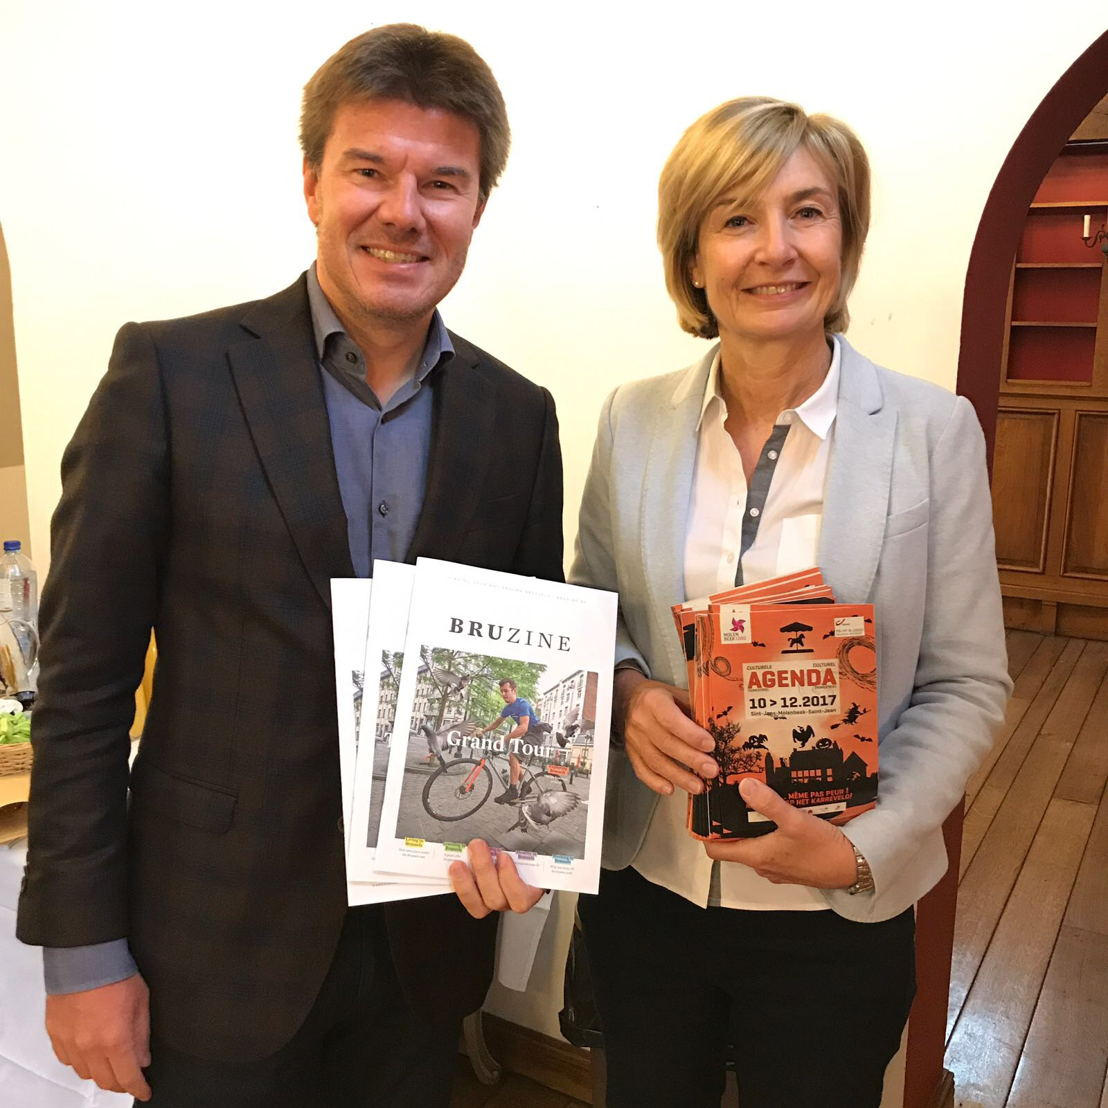 Sven Gatz et Françoise Schepmans